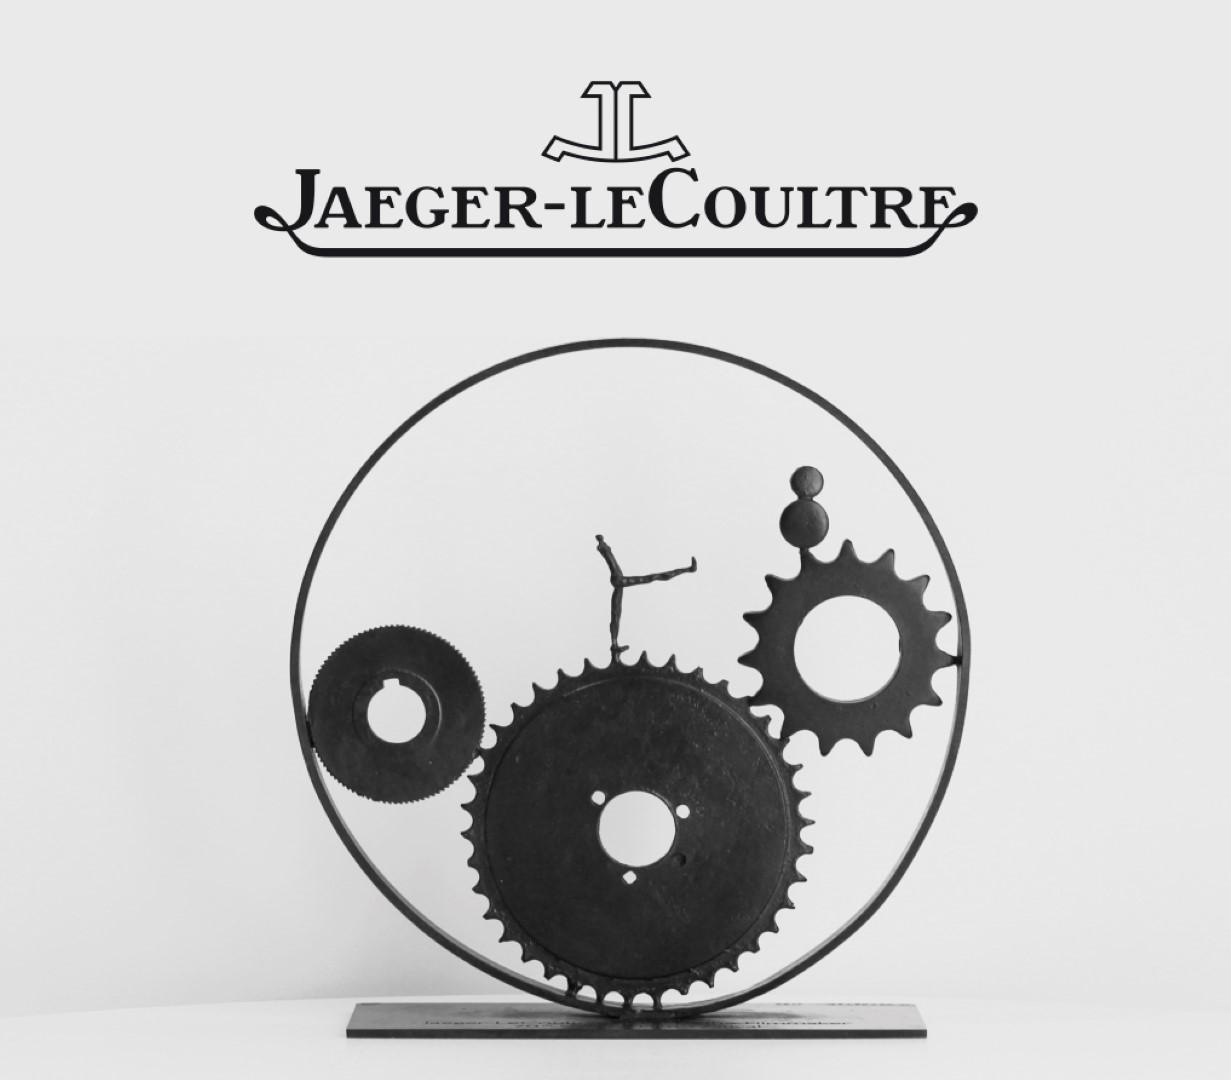 Festival Cinema Venezia 2018 Jaeger-LeCoultre